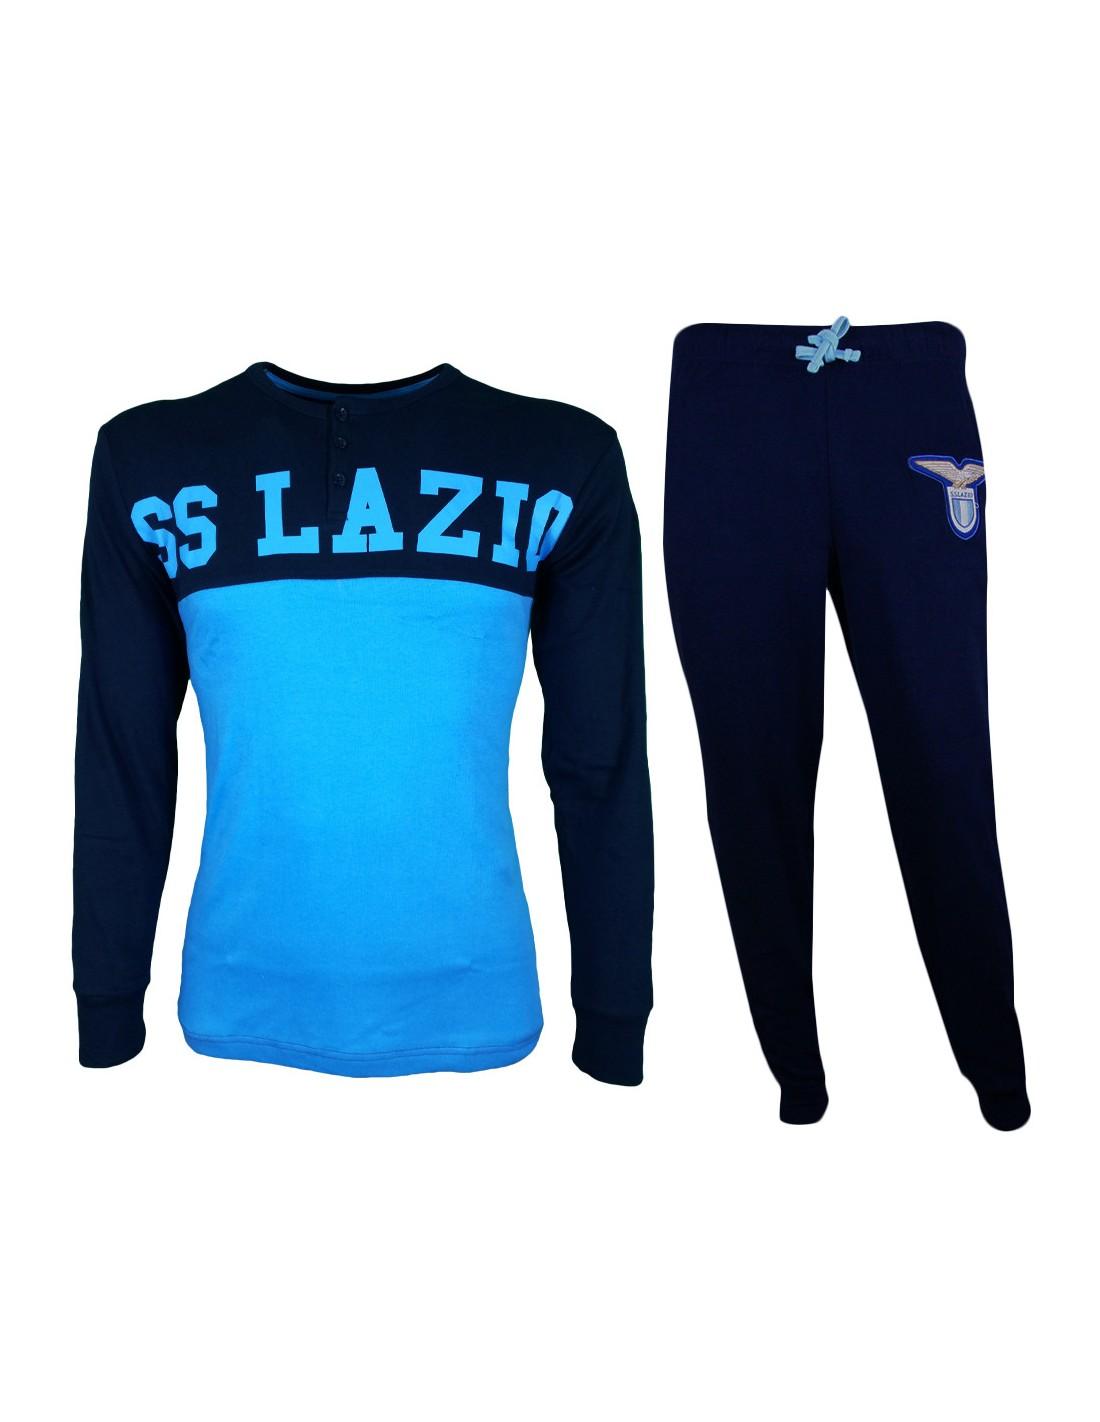 Macron Tuta Ufficiale SS Lazio 20202021 Uomo Bianca 58116368 Sport ...